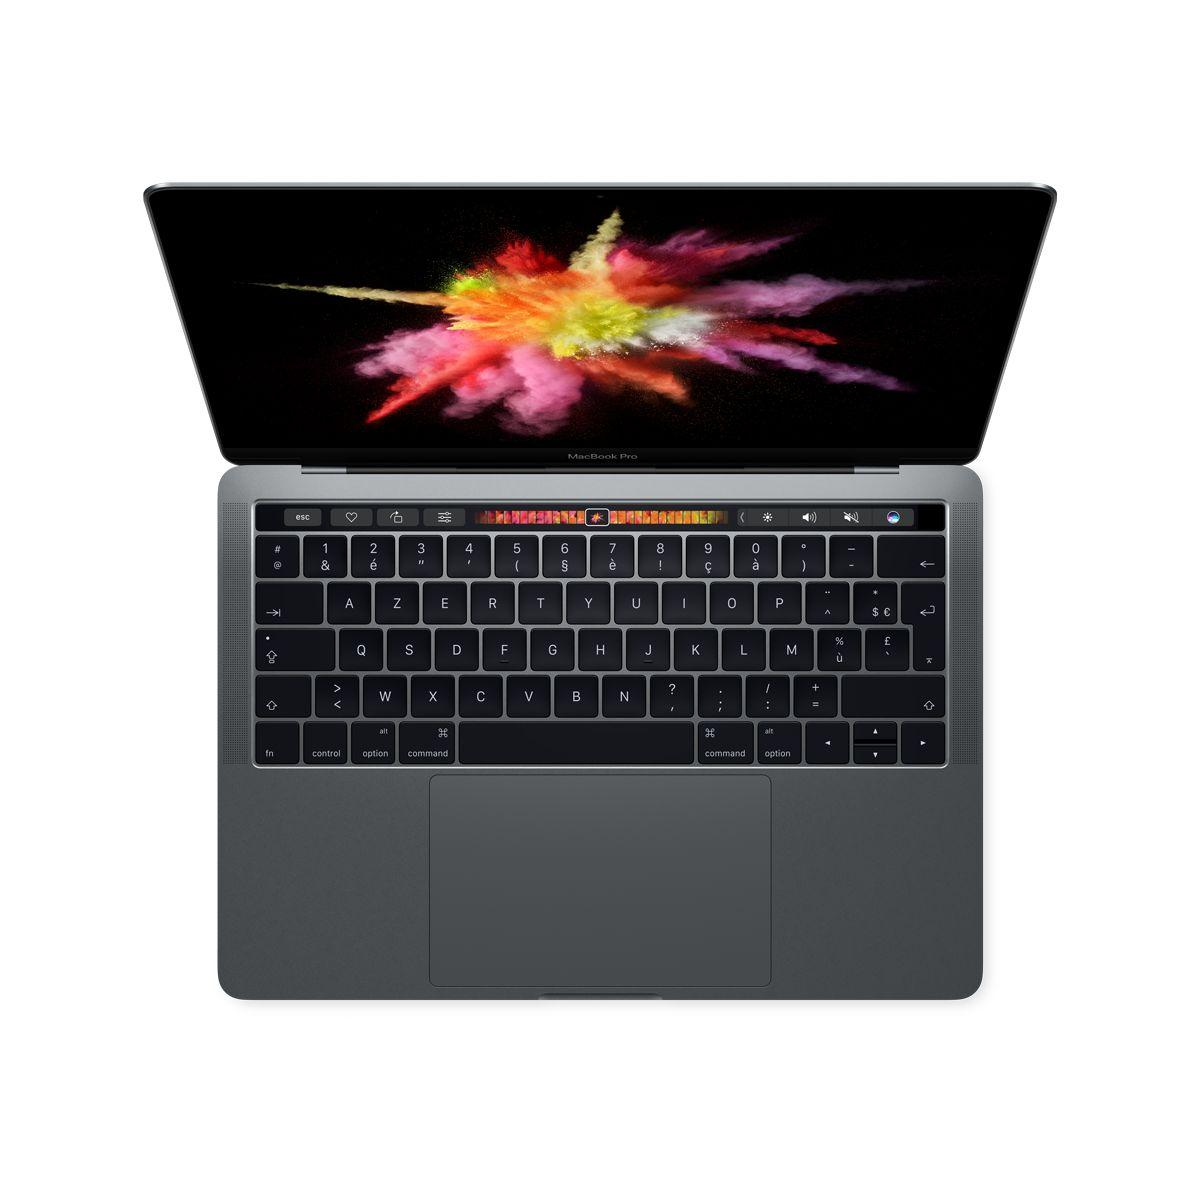 Ordinateur apple macbook cto new pro 13 i5 tb 16go 512go gris sid - livraison offerte : code livdom (photo)